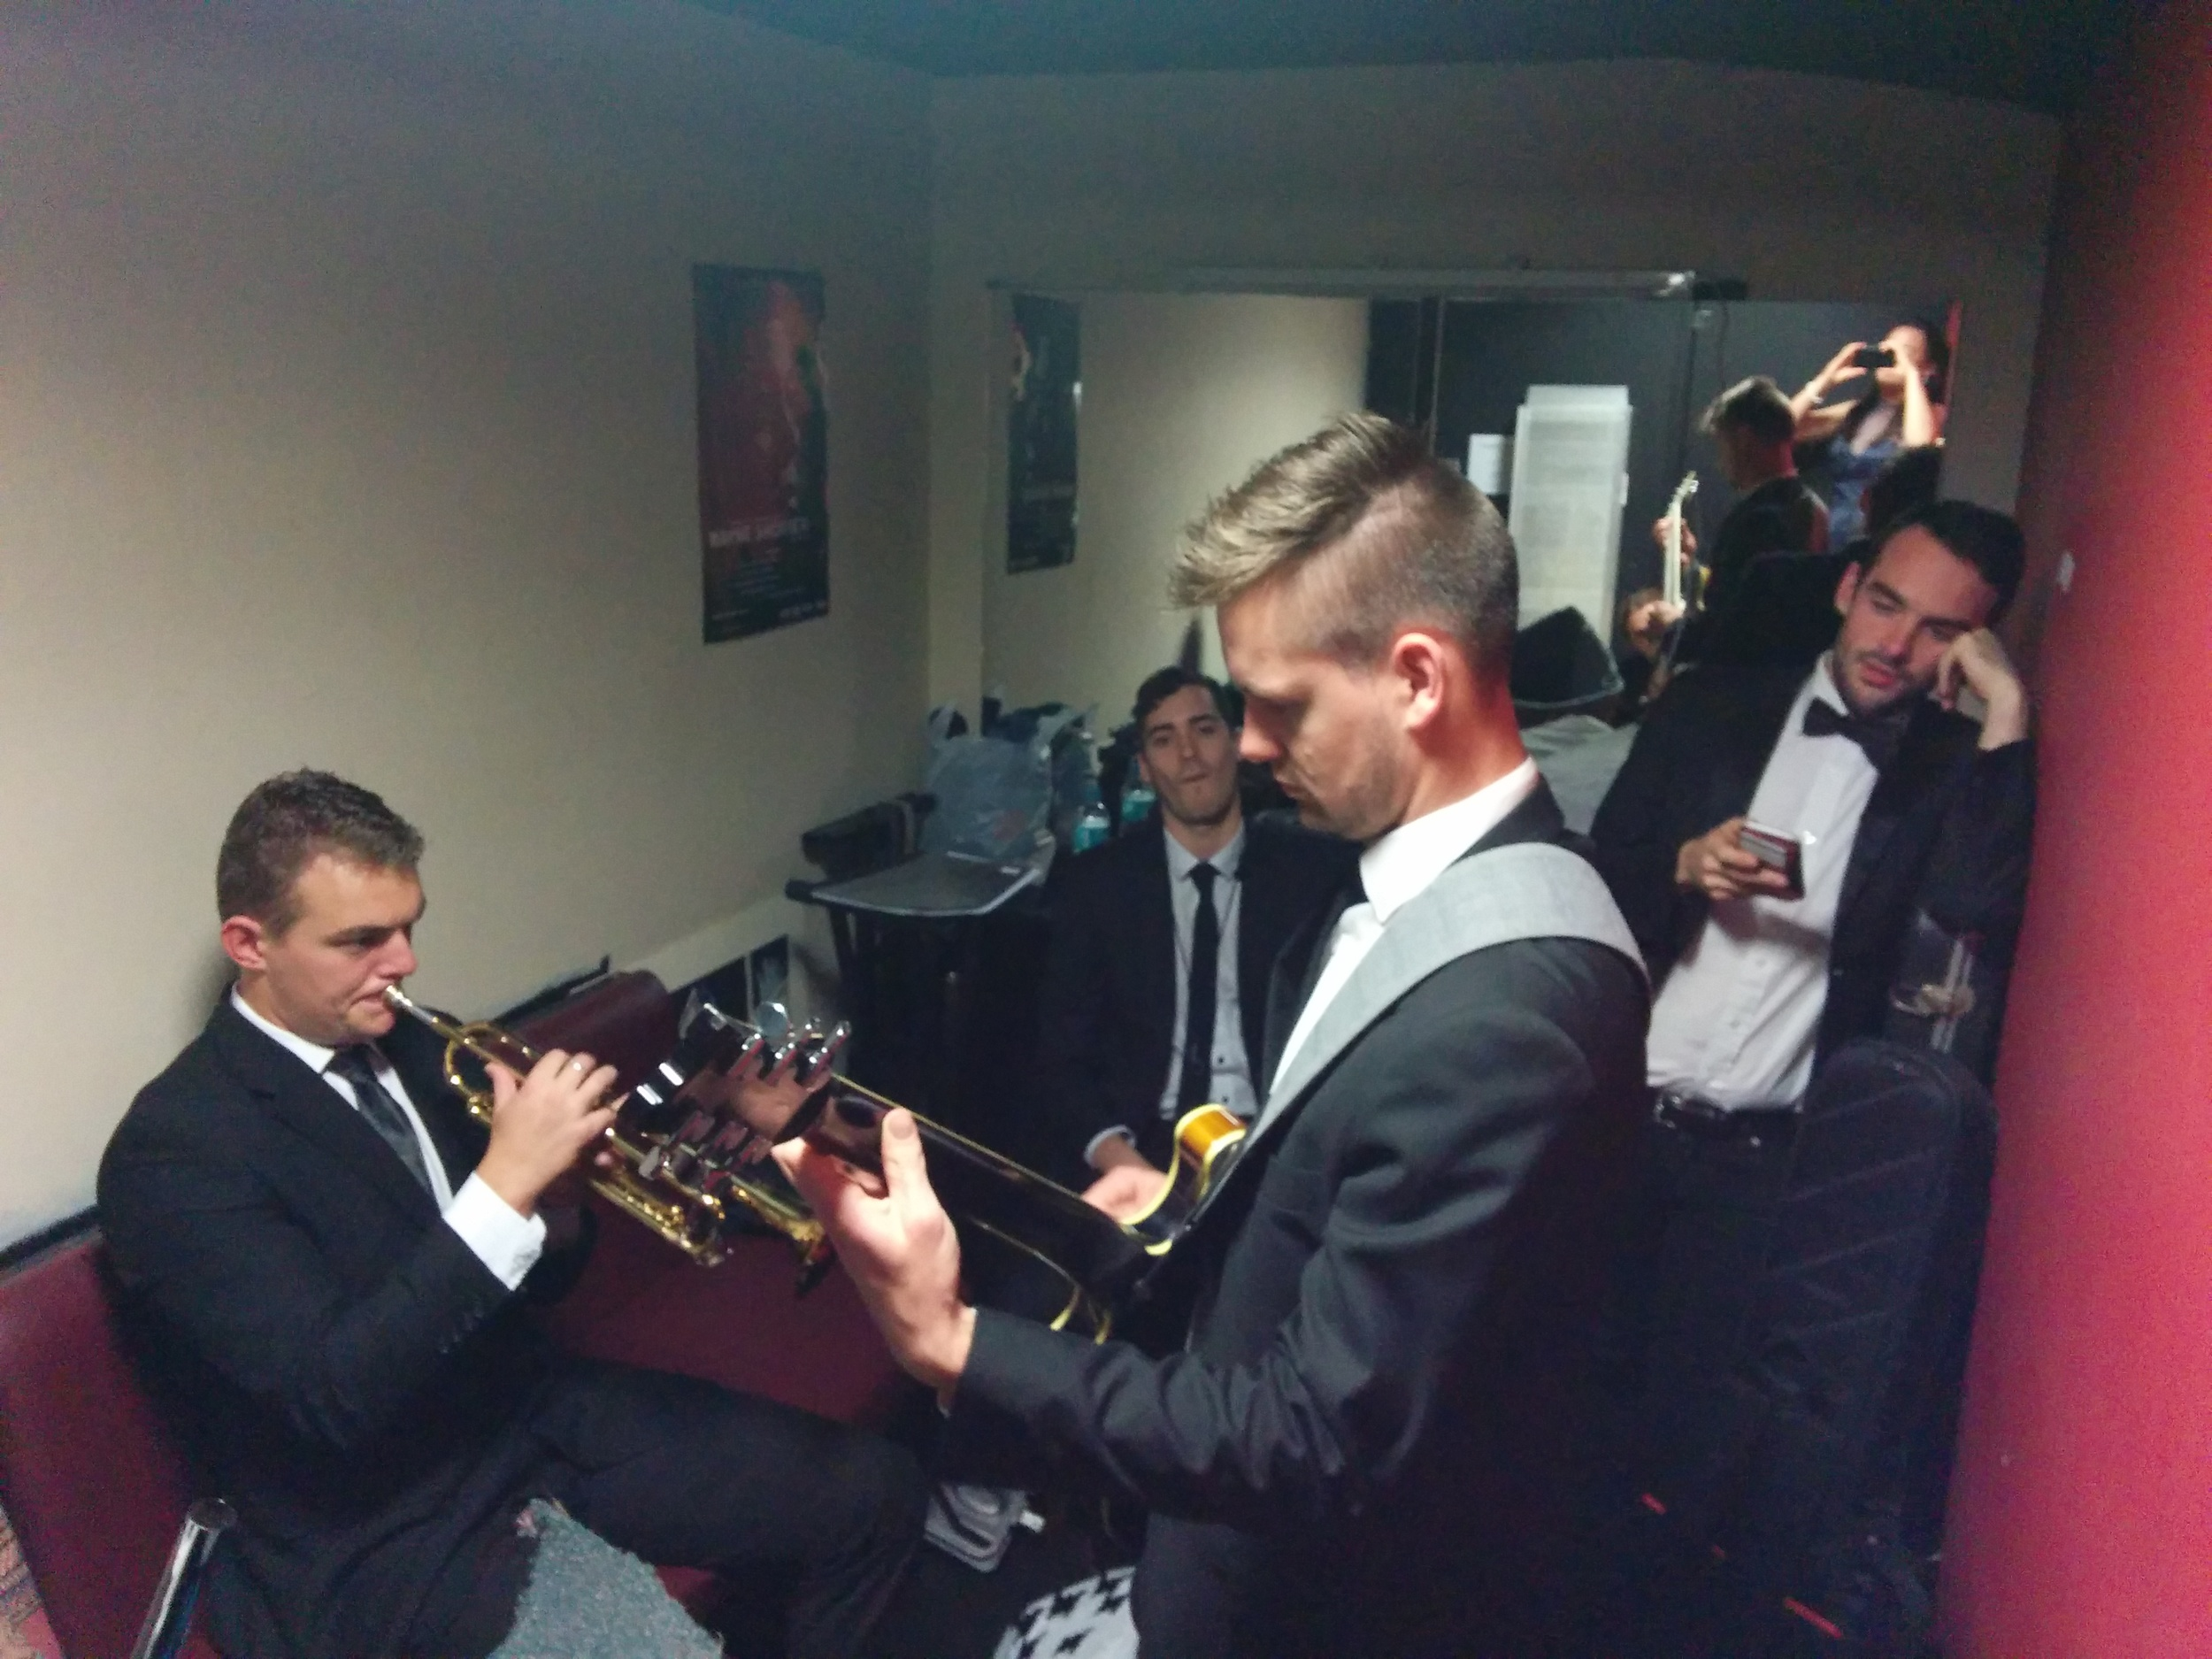 Band warming up backstage...